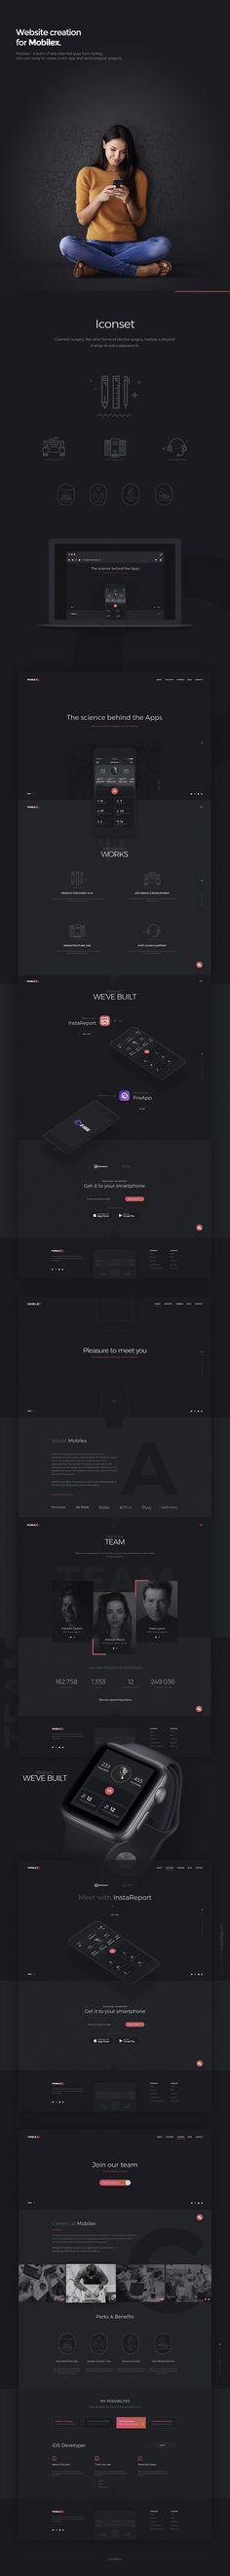 Mobilex Website